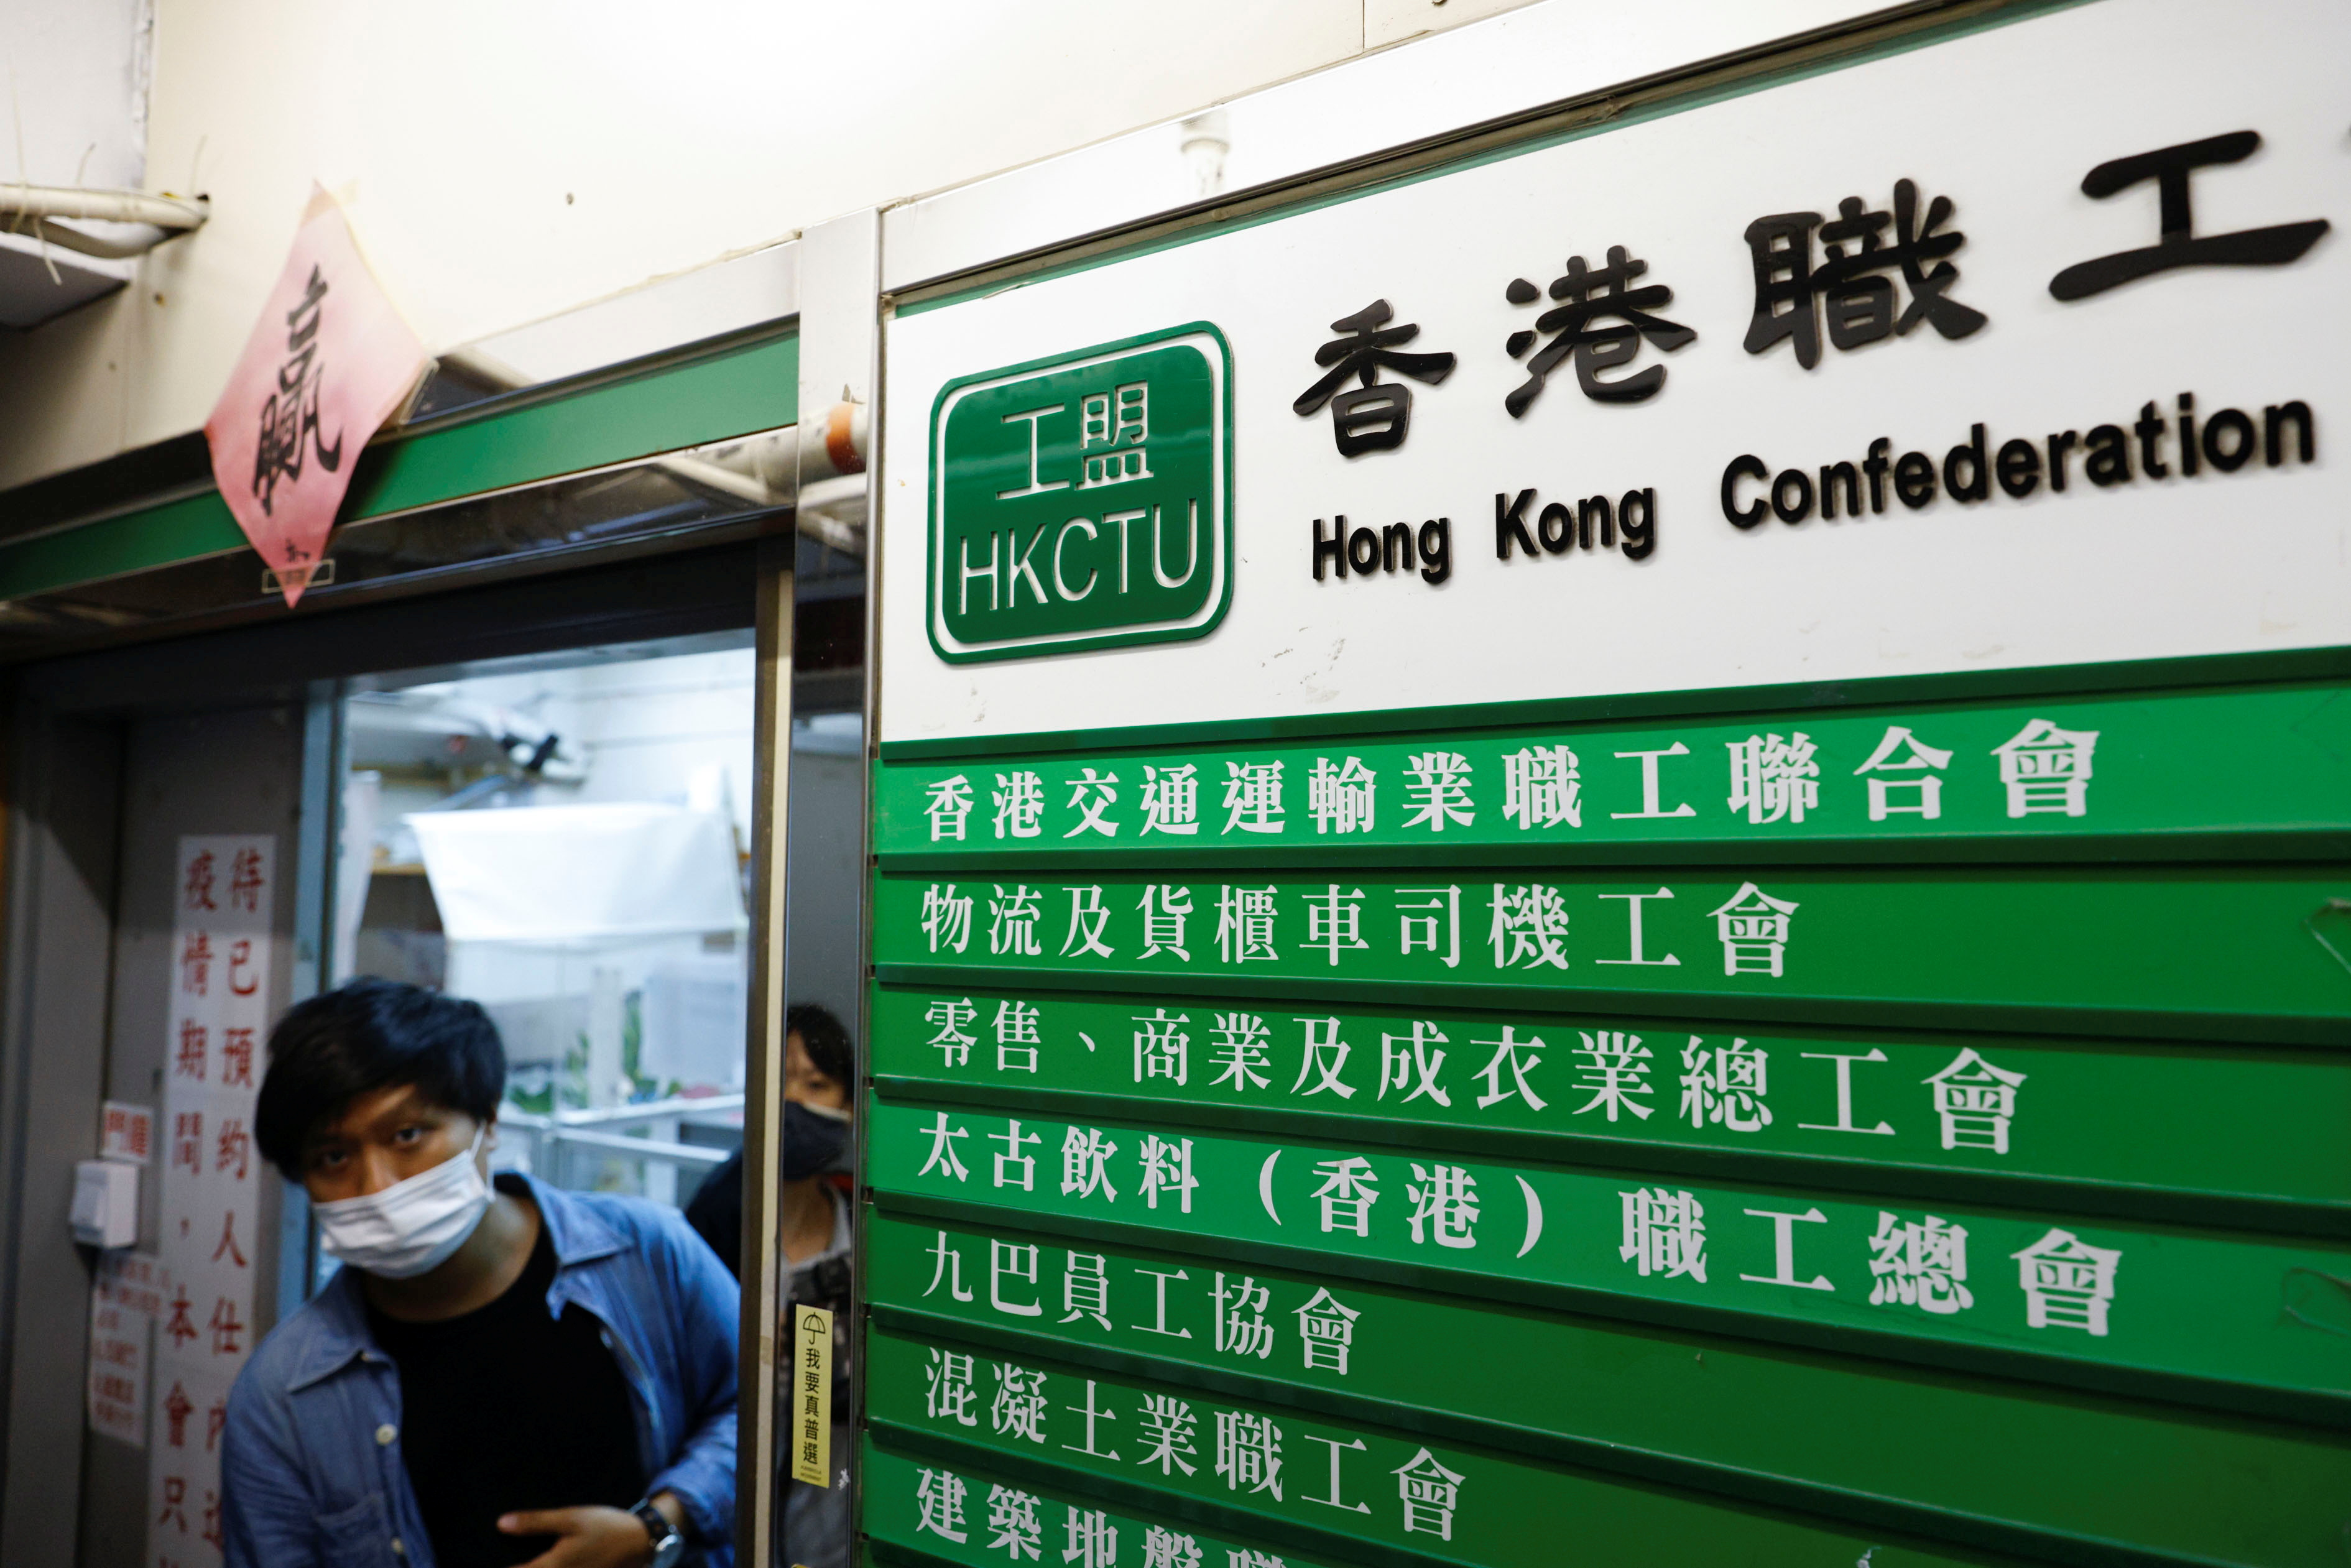 A man walks out of a Hong Kong Confederation of Trade Unions (HKCTU) office, in Hong Kong, China September 19, 2021. REUTERS/Tyrone Siu